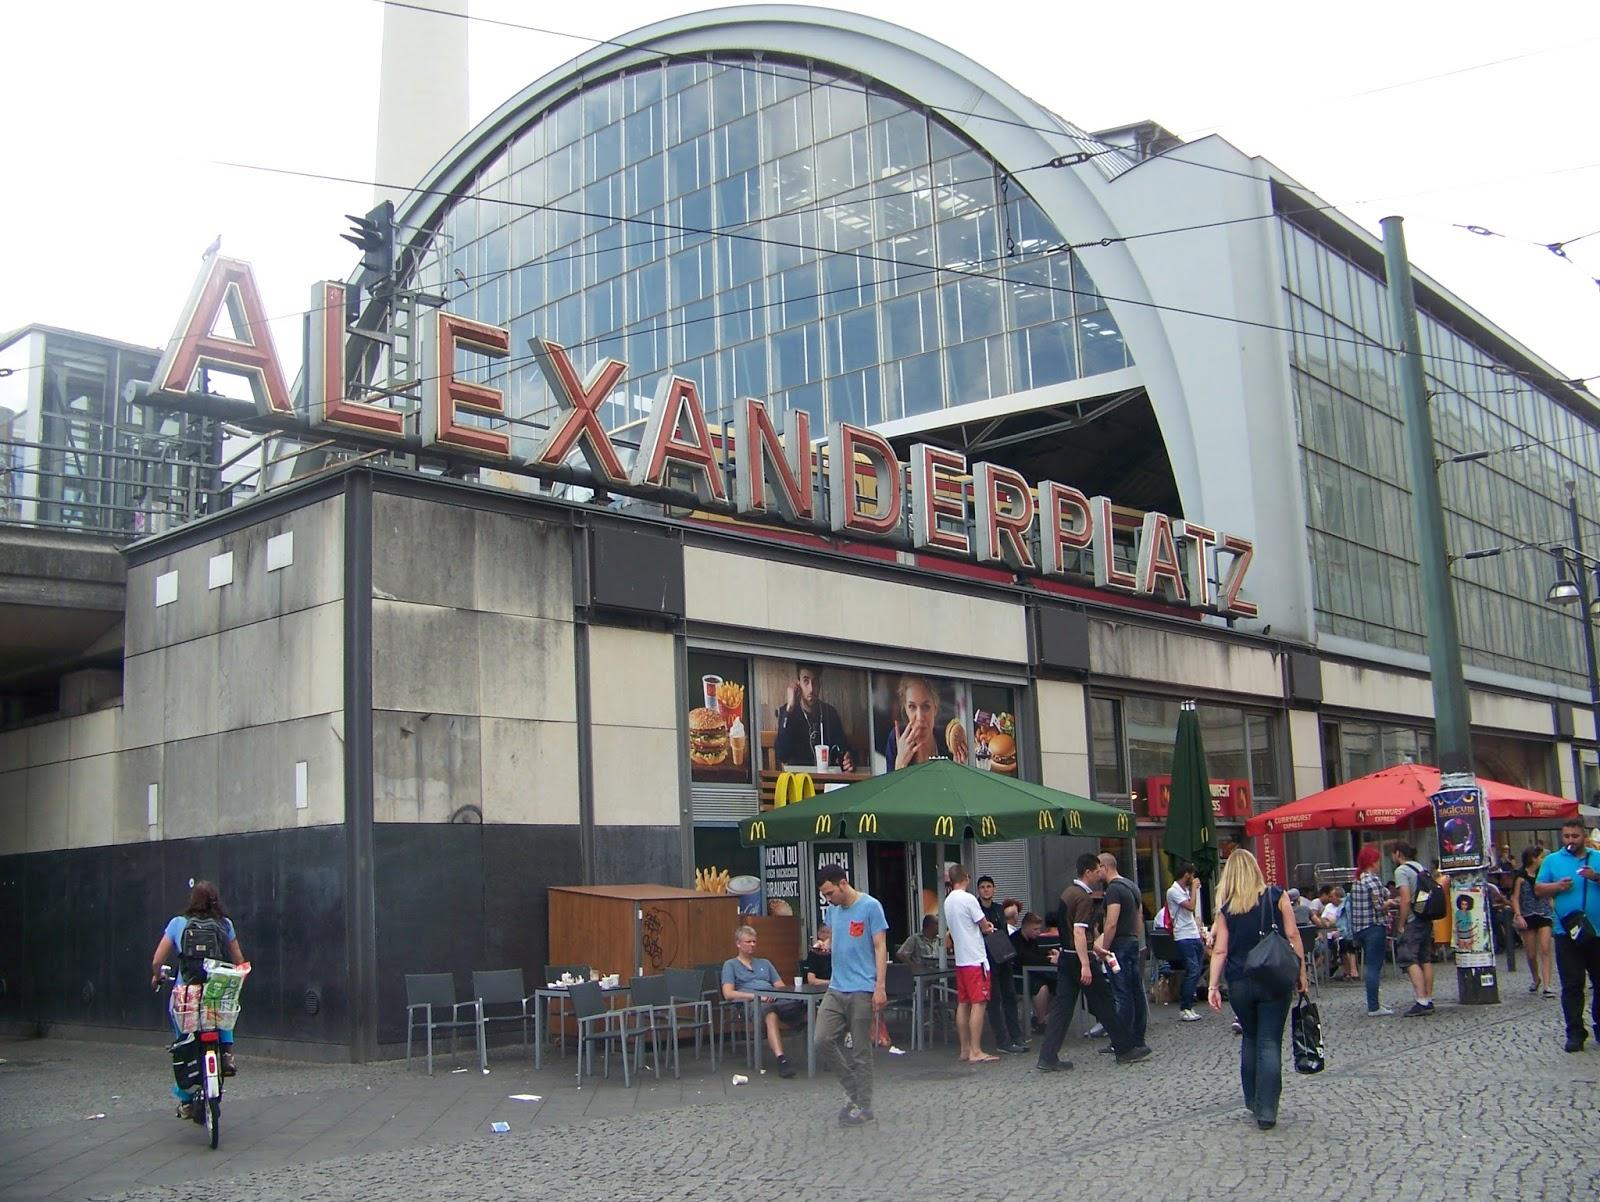 restaurant im fernsehturm berlin